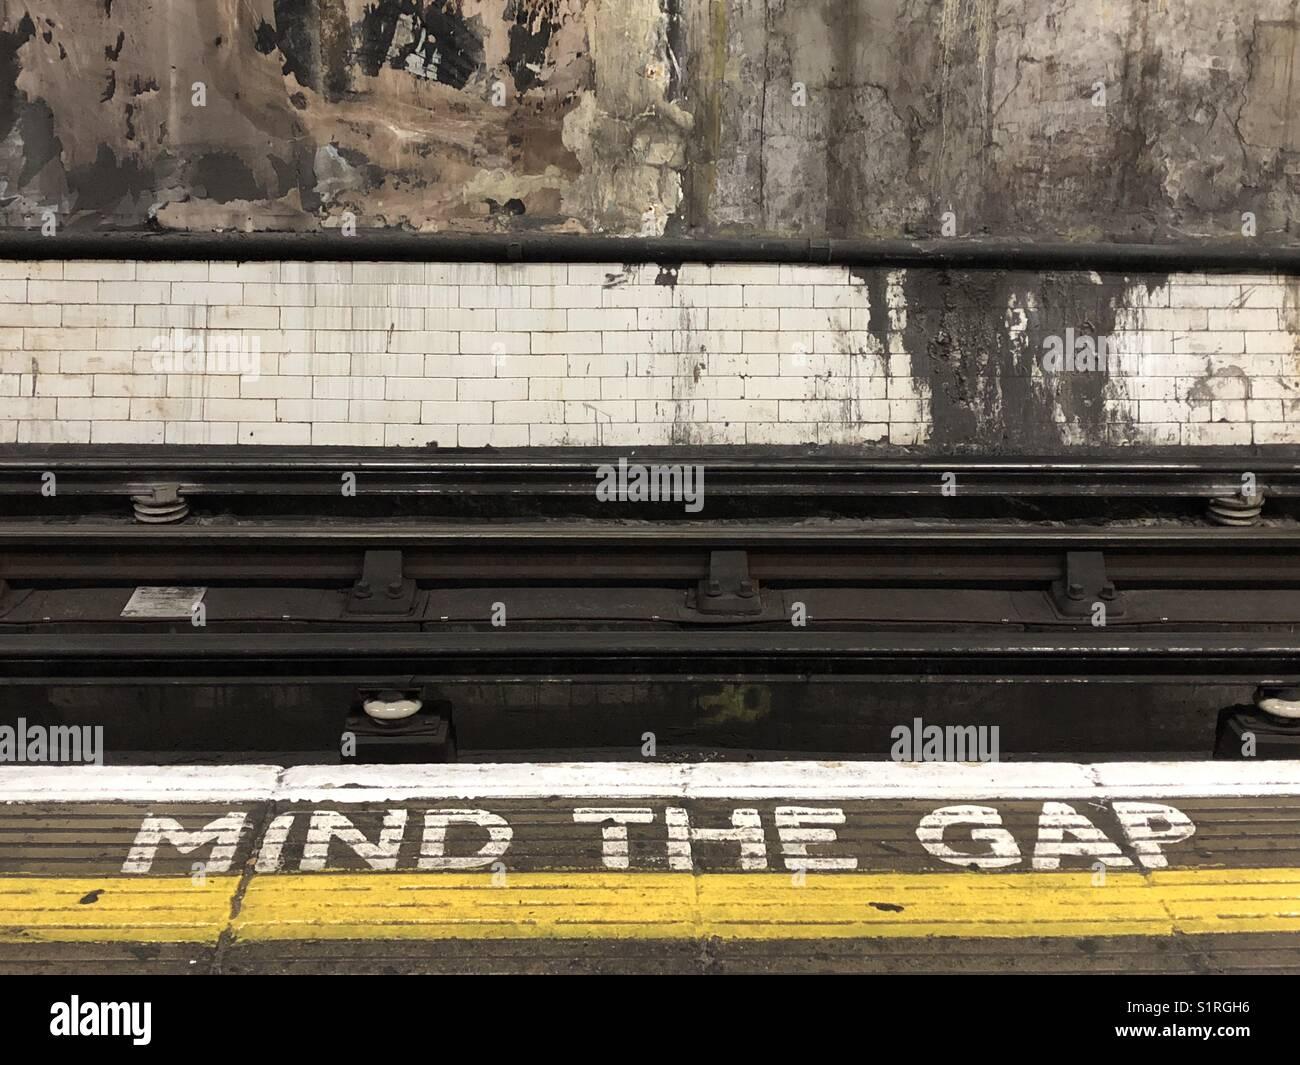 Mind the gap, London Underground platform and track - Stock Image